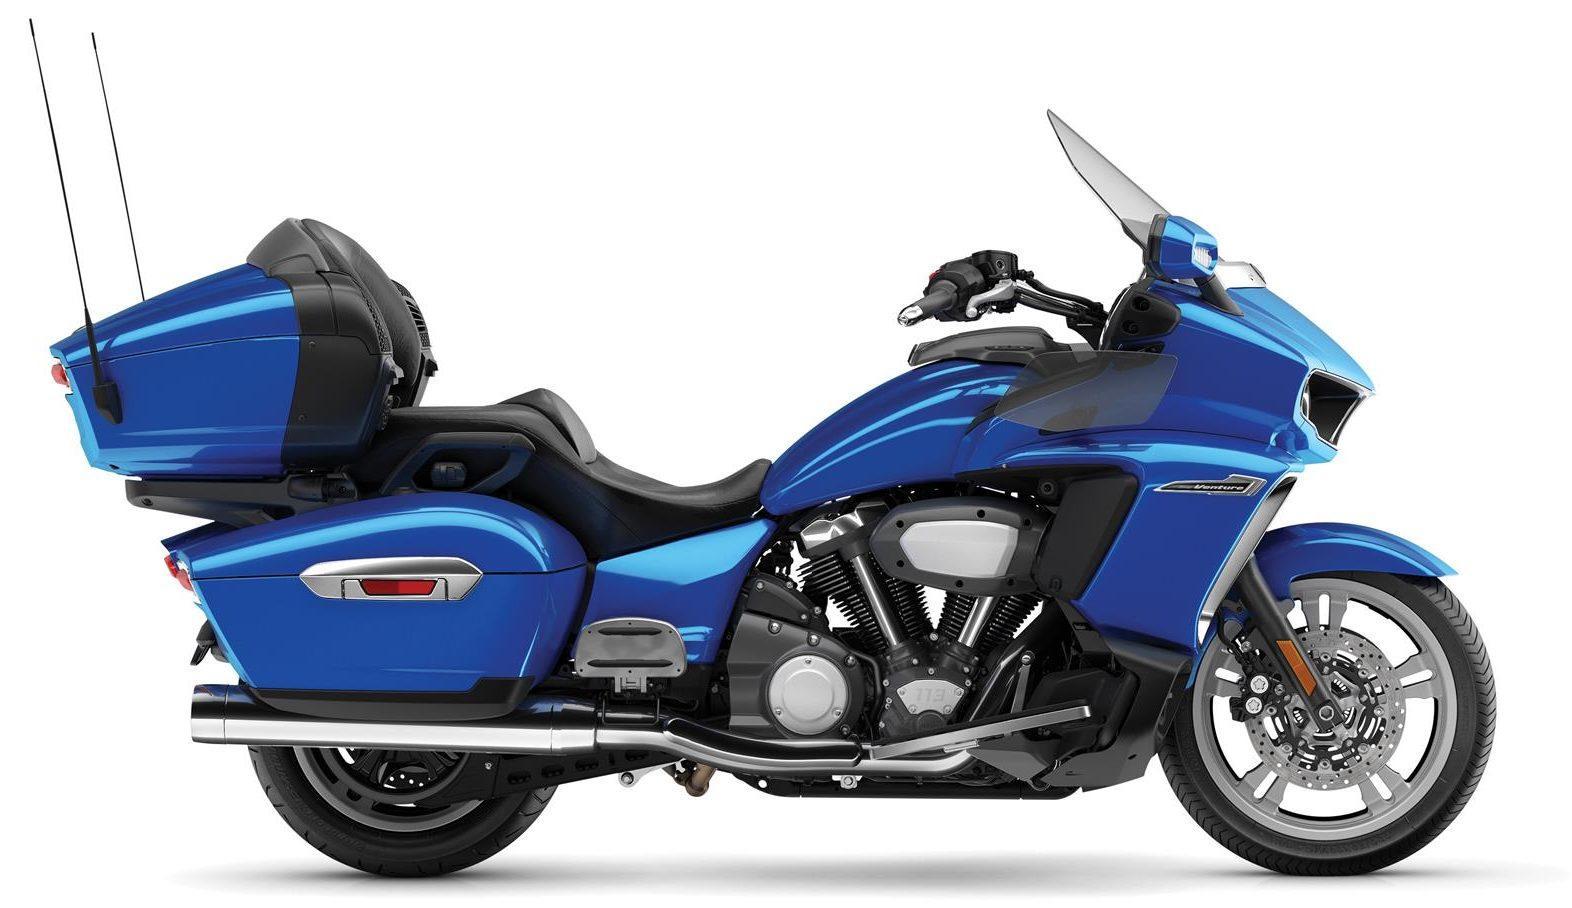 Yamaha STAR VENTURE mavi sağ profil